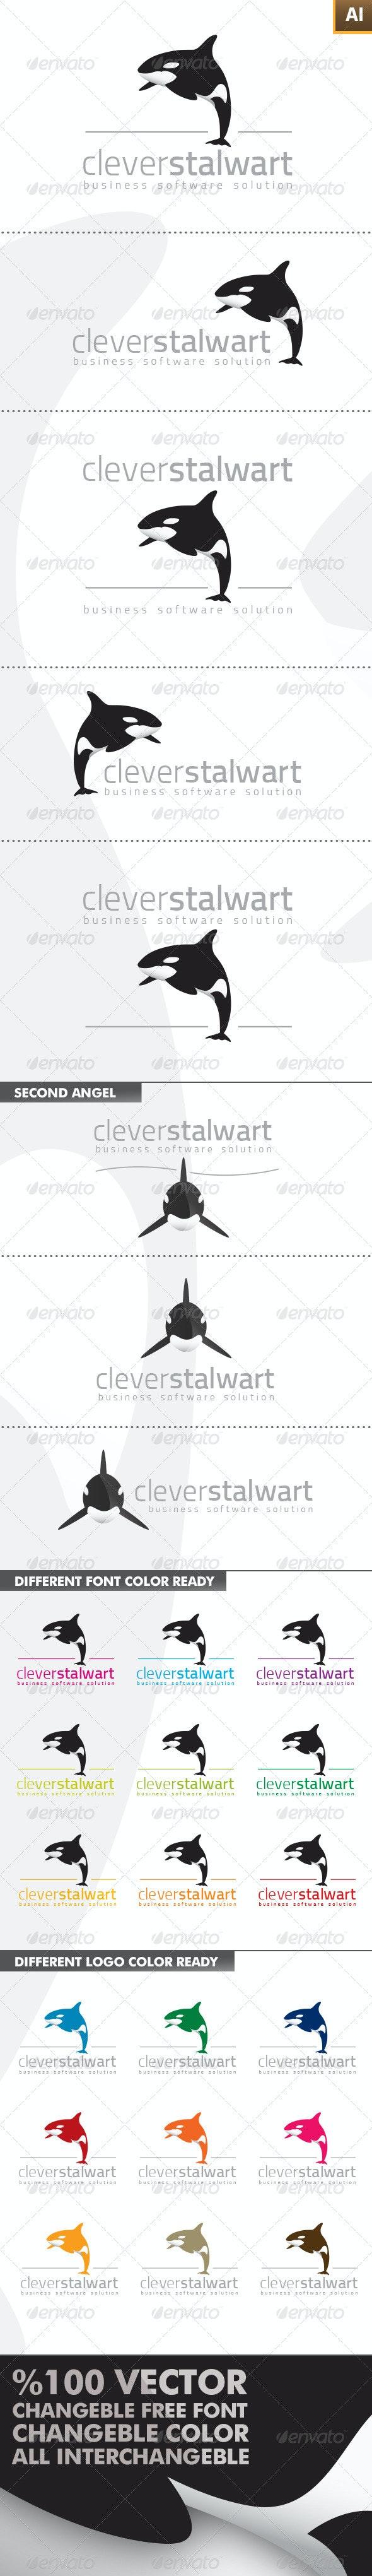 Clever Stalwart Logo - Animals Logo Templates